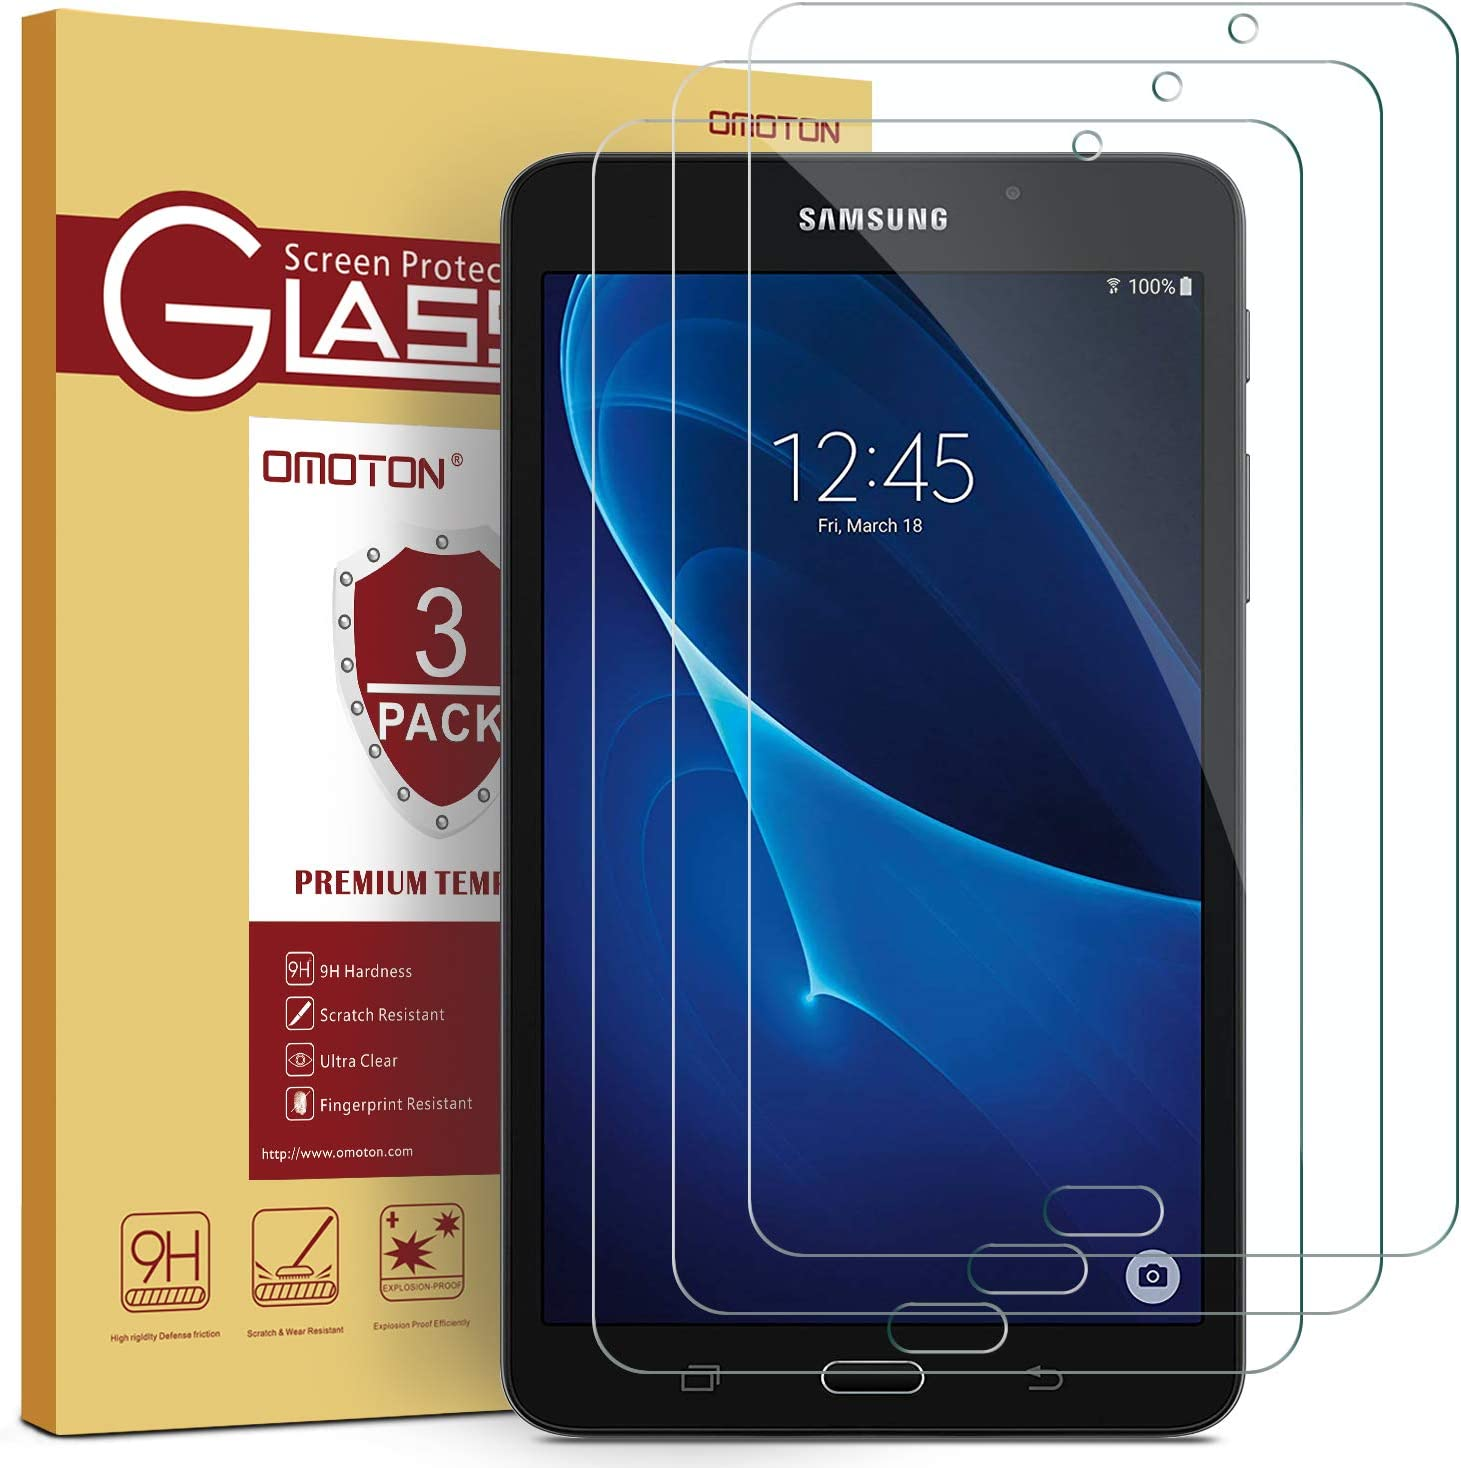 Samsung Galaxy Tab A 7.0 Screen Protector Glossy Clear//Anti-Glare